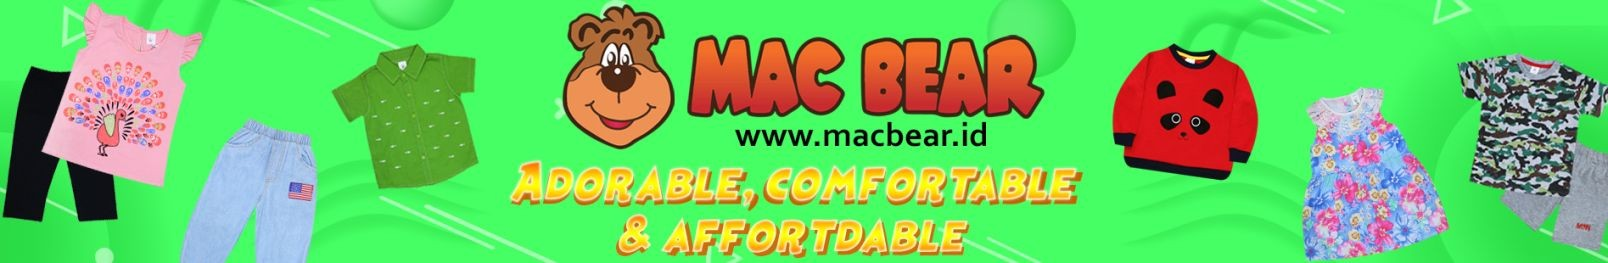 MacBear ID